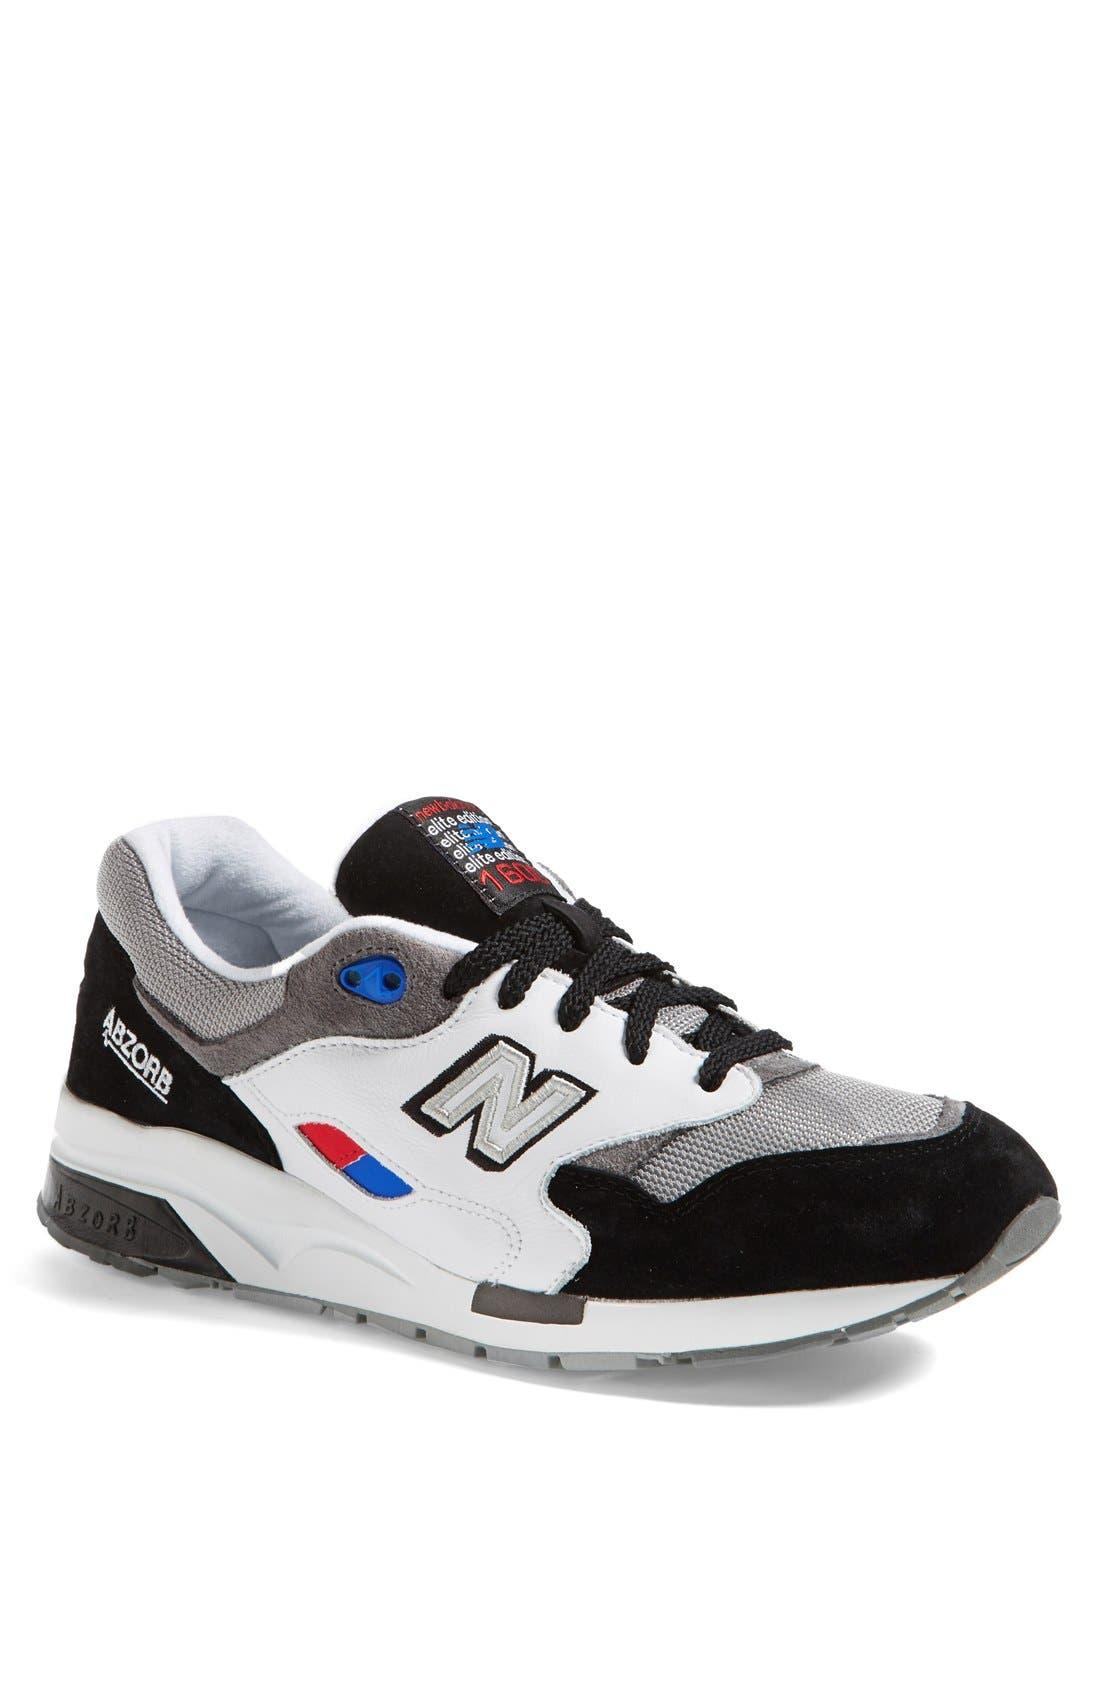 Alternate Image 1 Selected - New Balance '1600' Sneaker (Men)